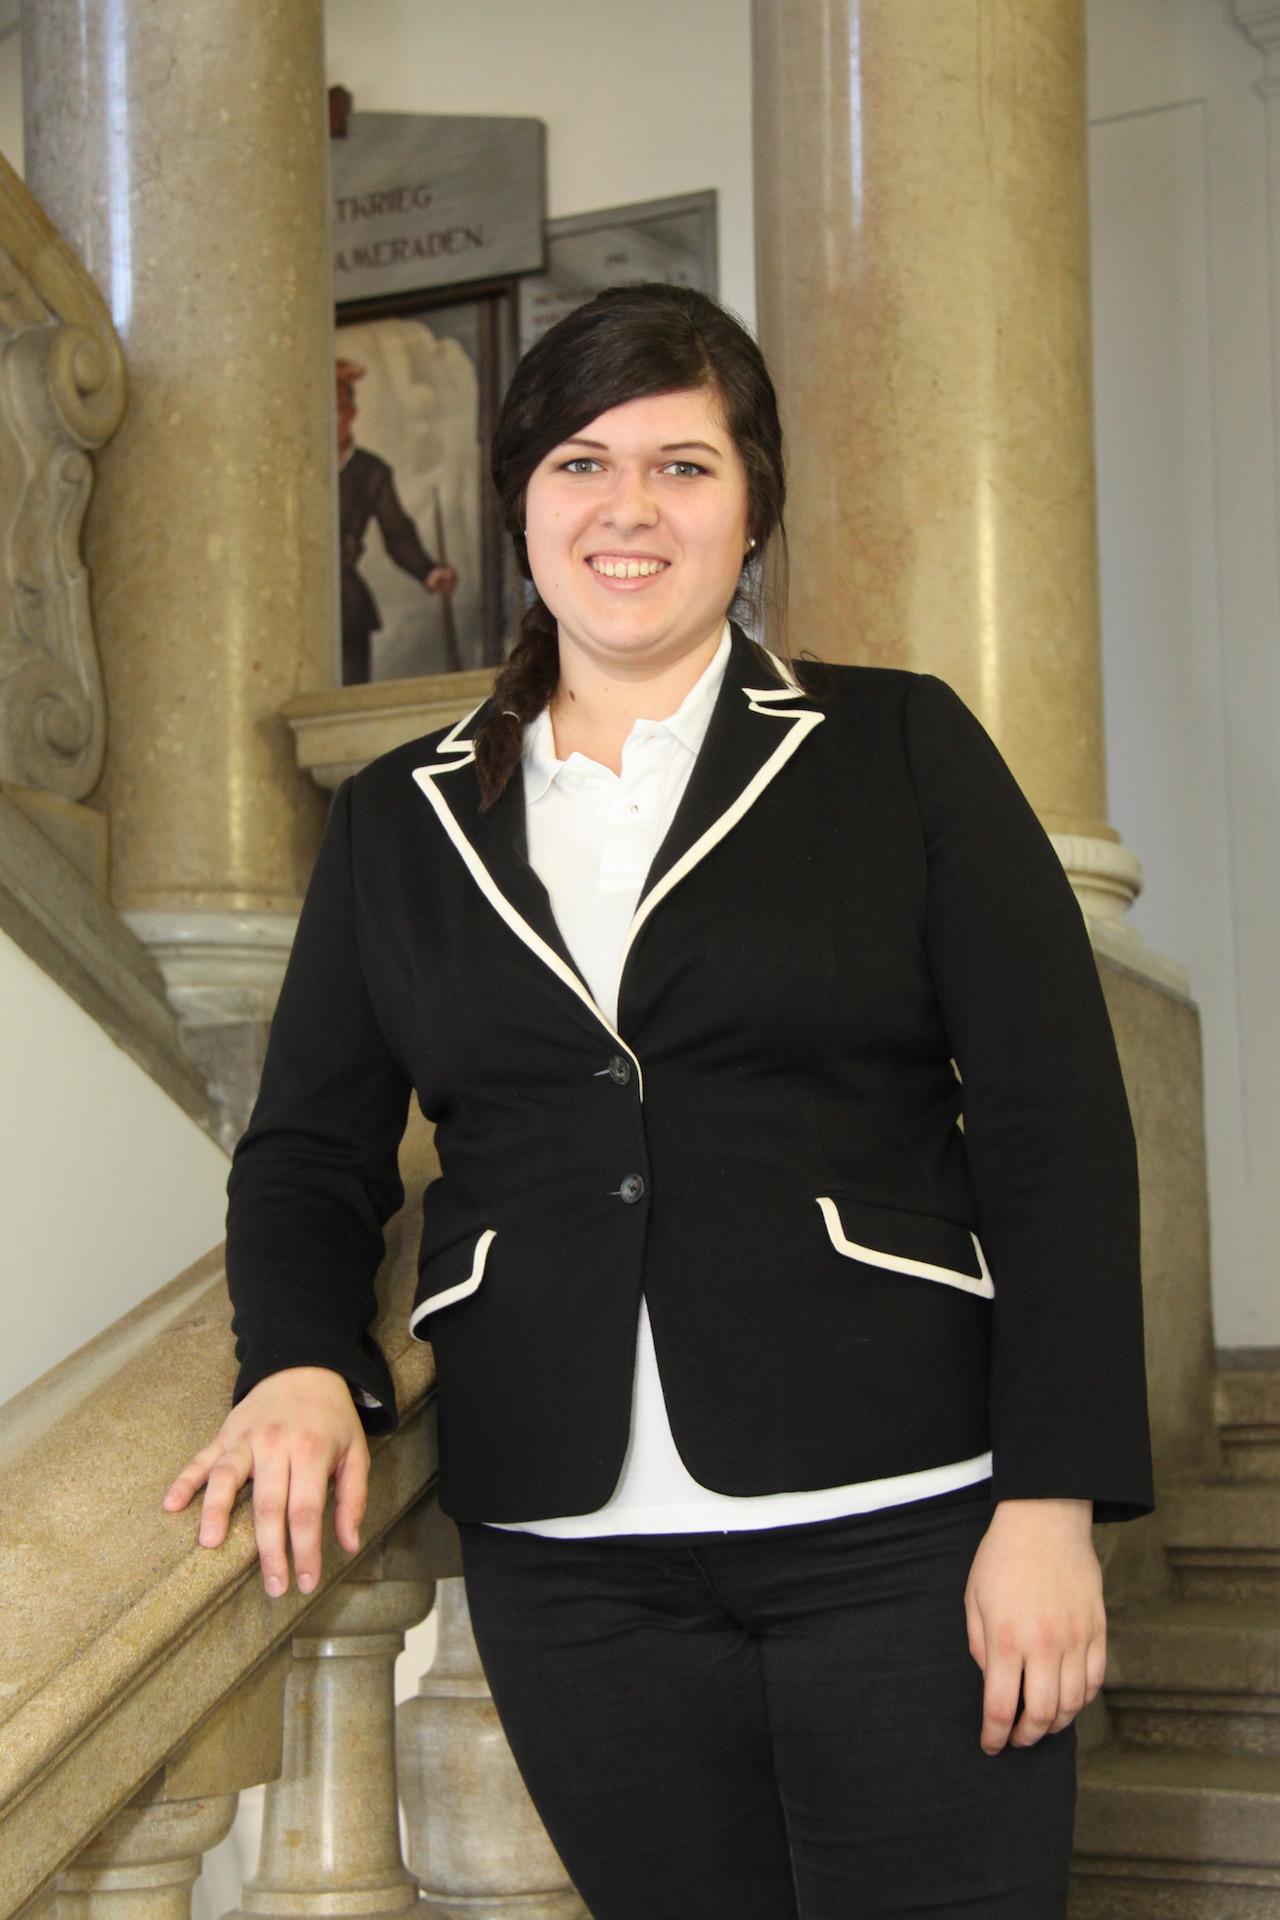 Antonia Thurmaier - Public Relation Officer